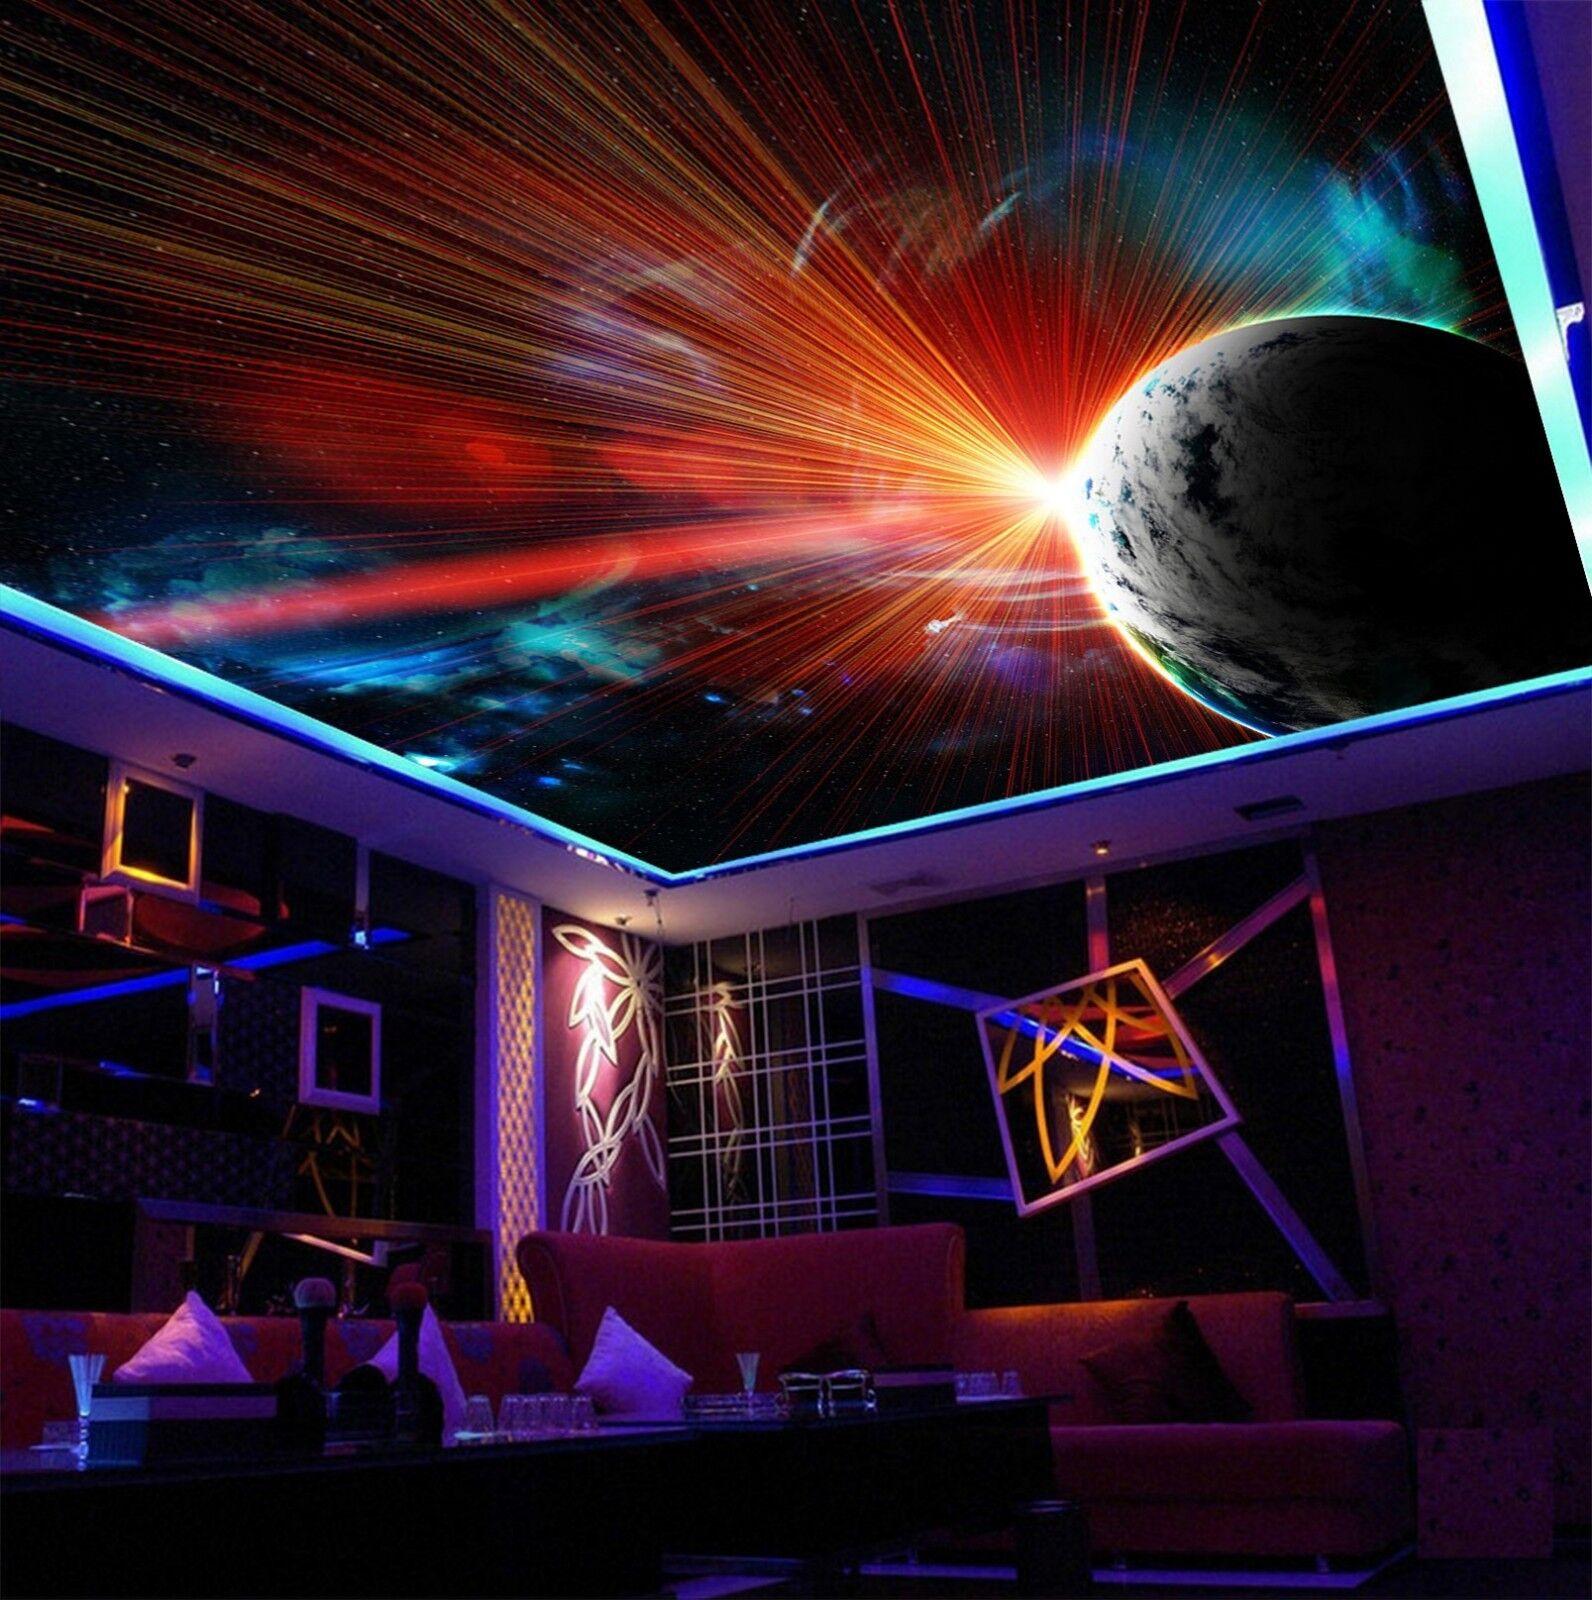 3D Universe Planet 836 Wall Paper Wall Print Decal Wall Deco AJ WALLPAPER Summer